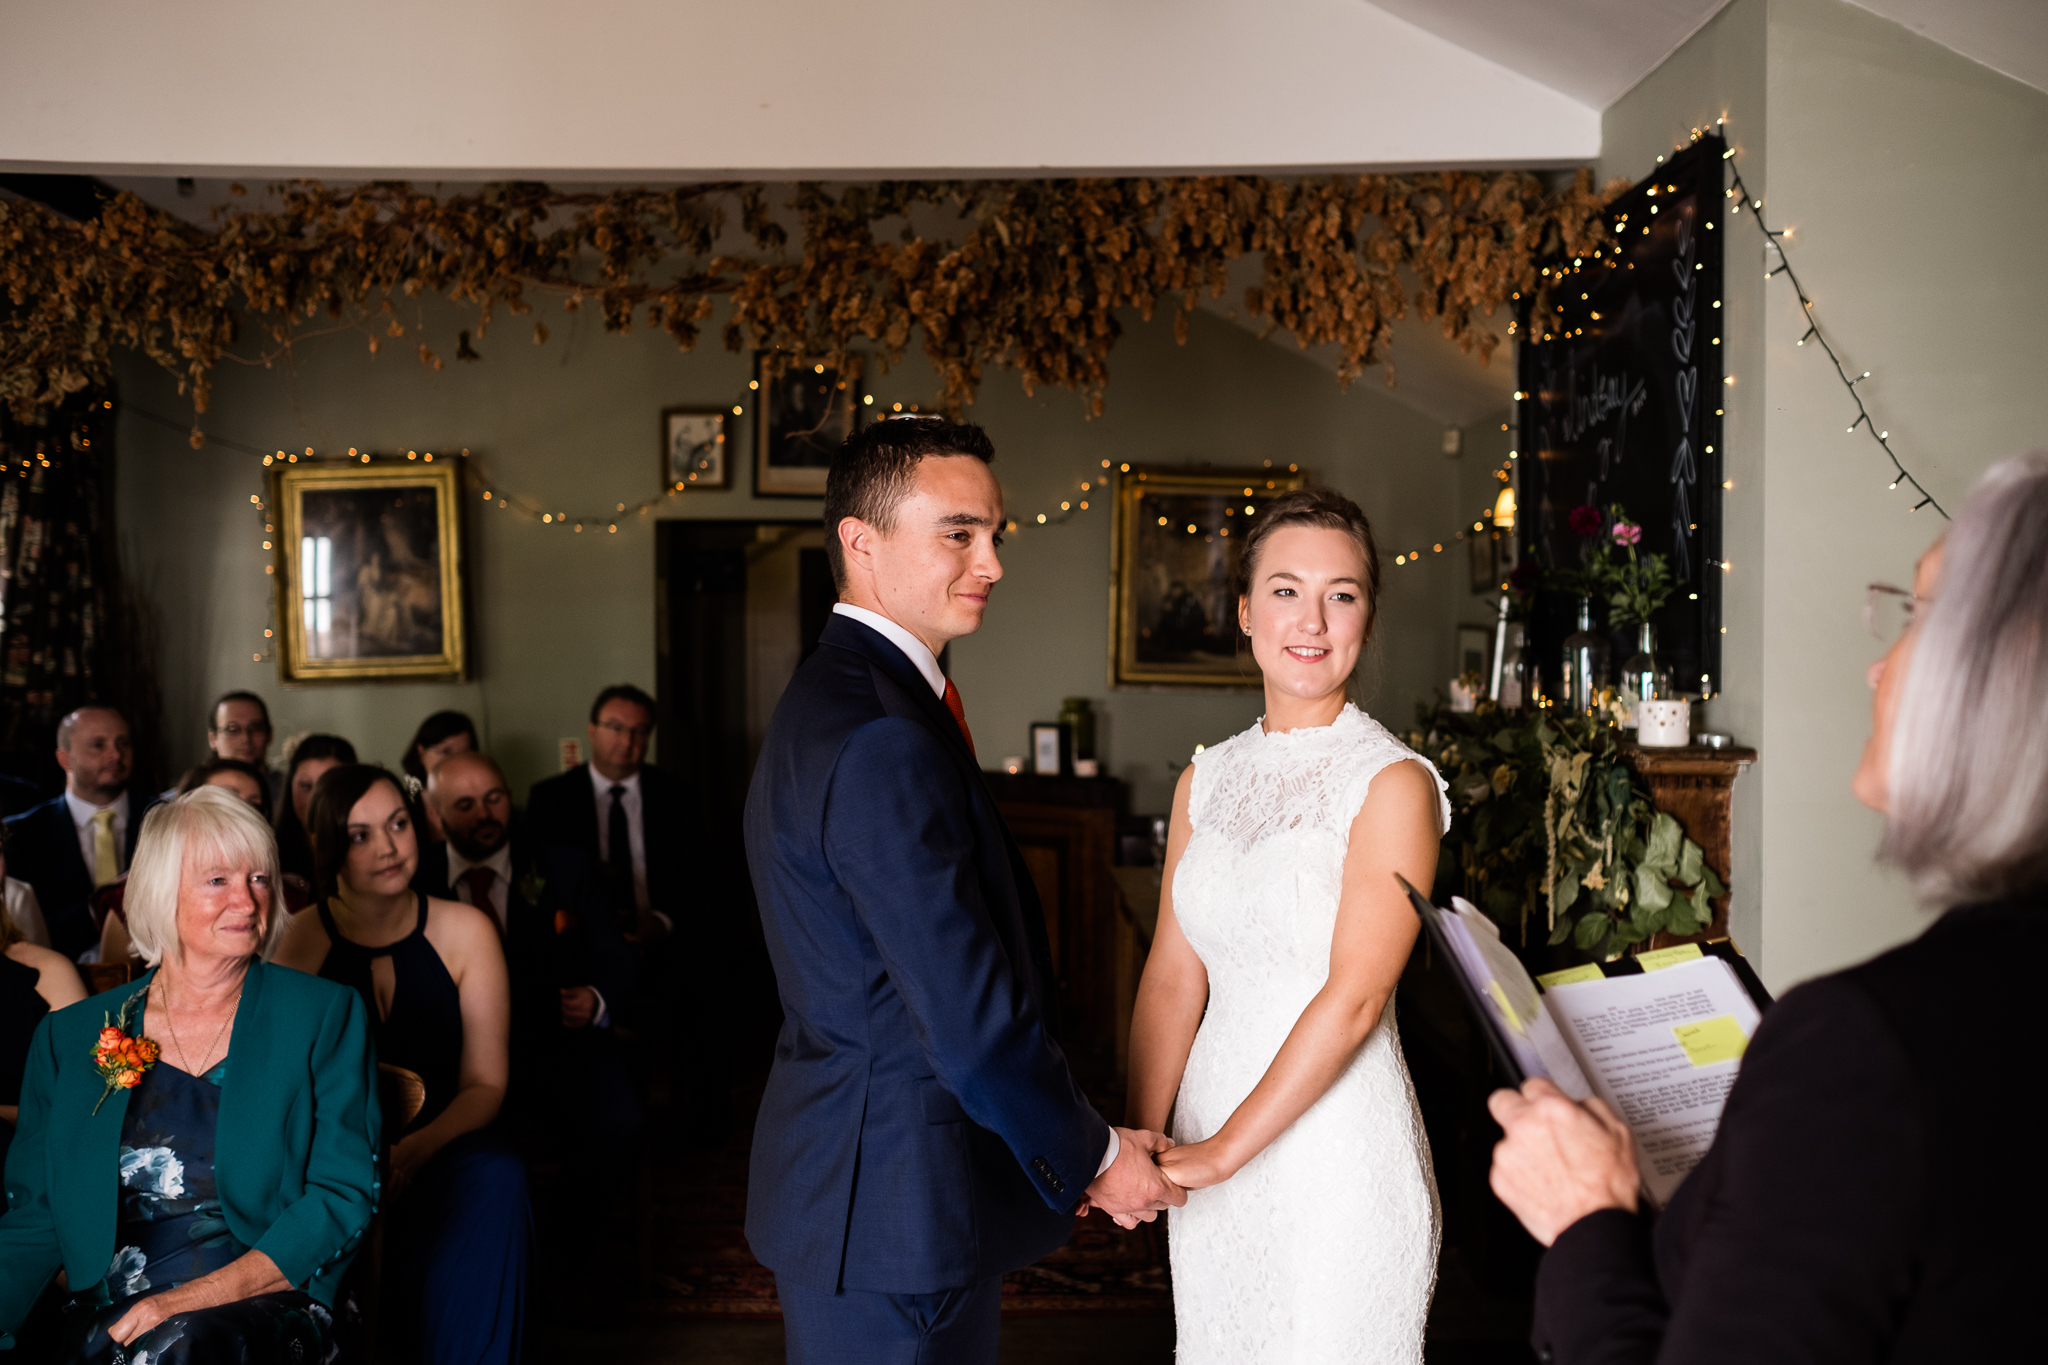 Relaxed Documentary Wedding Photography at The Wizard Inn, Alderley Edge Cheshire - Jenny Harper-31.jpg